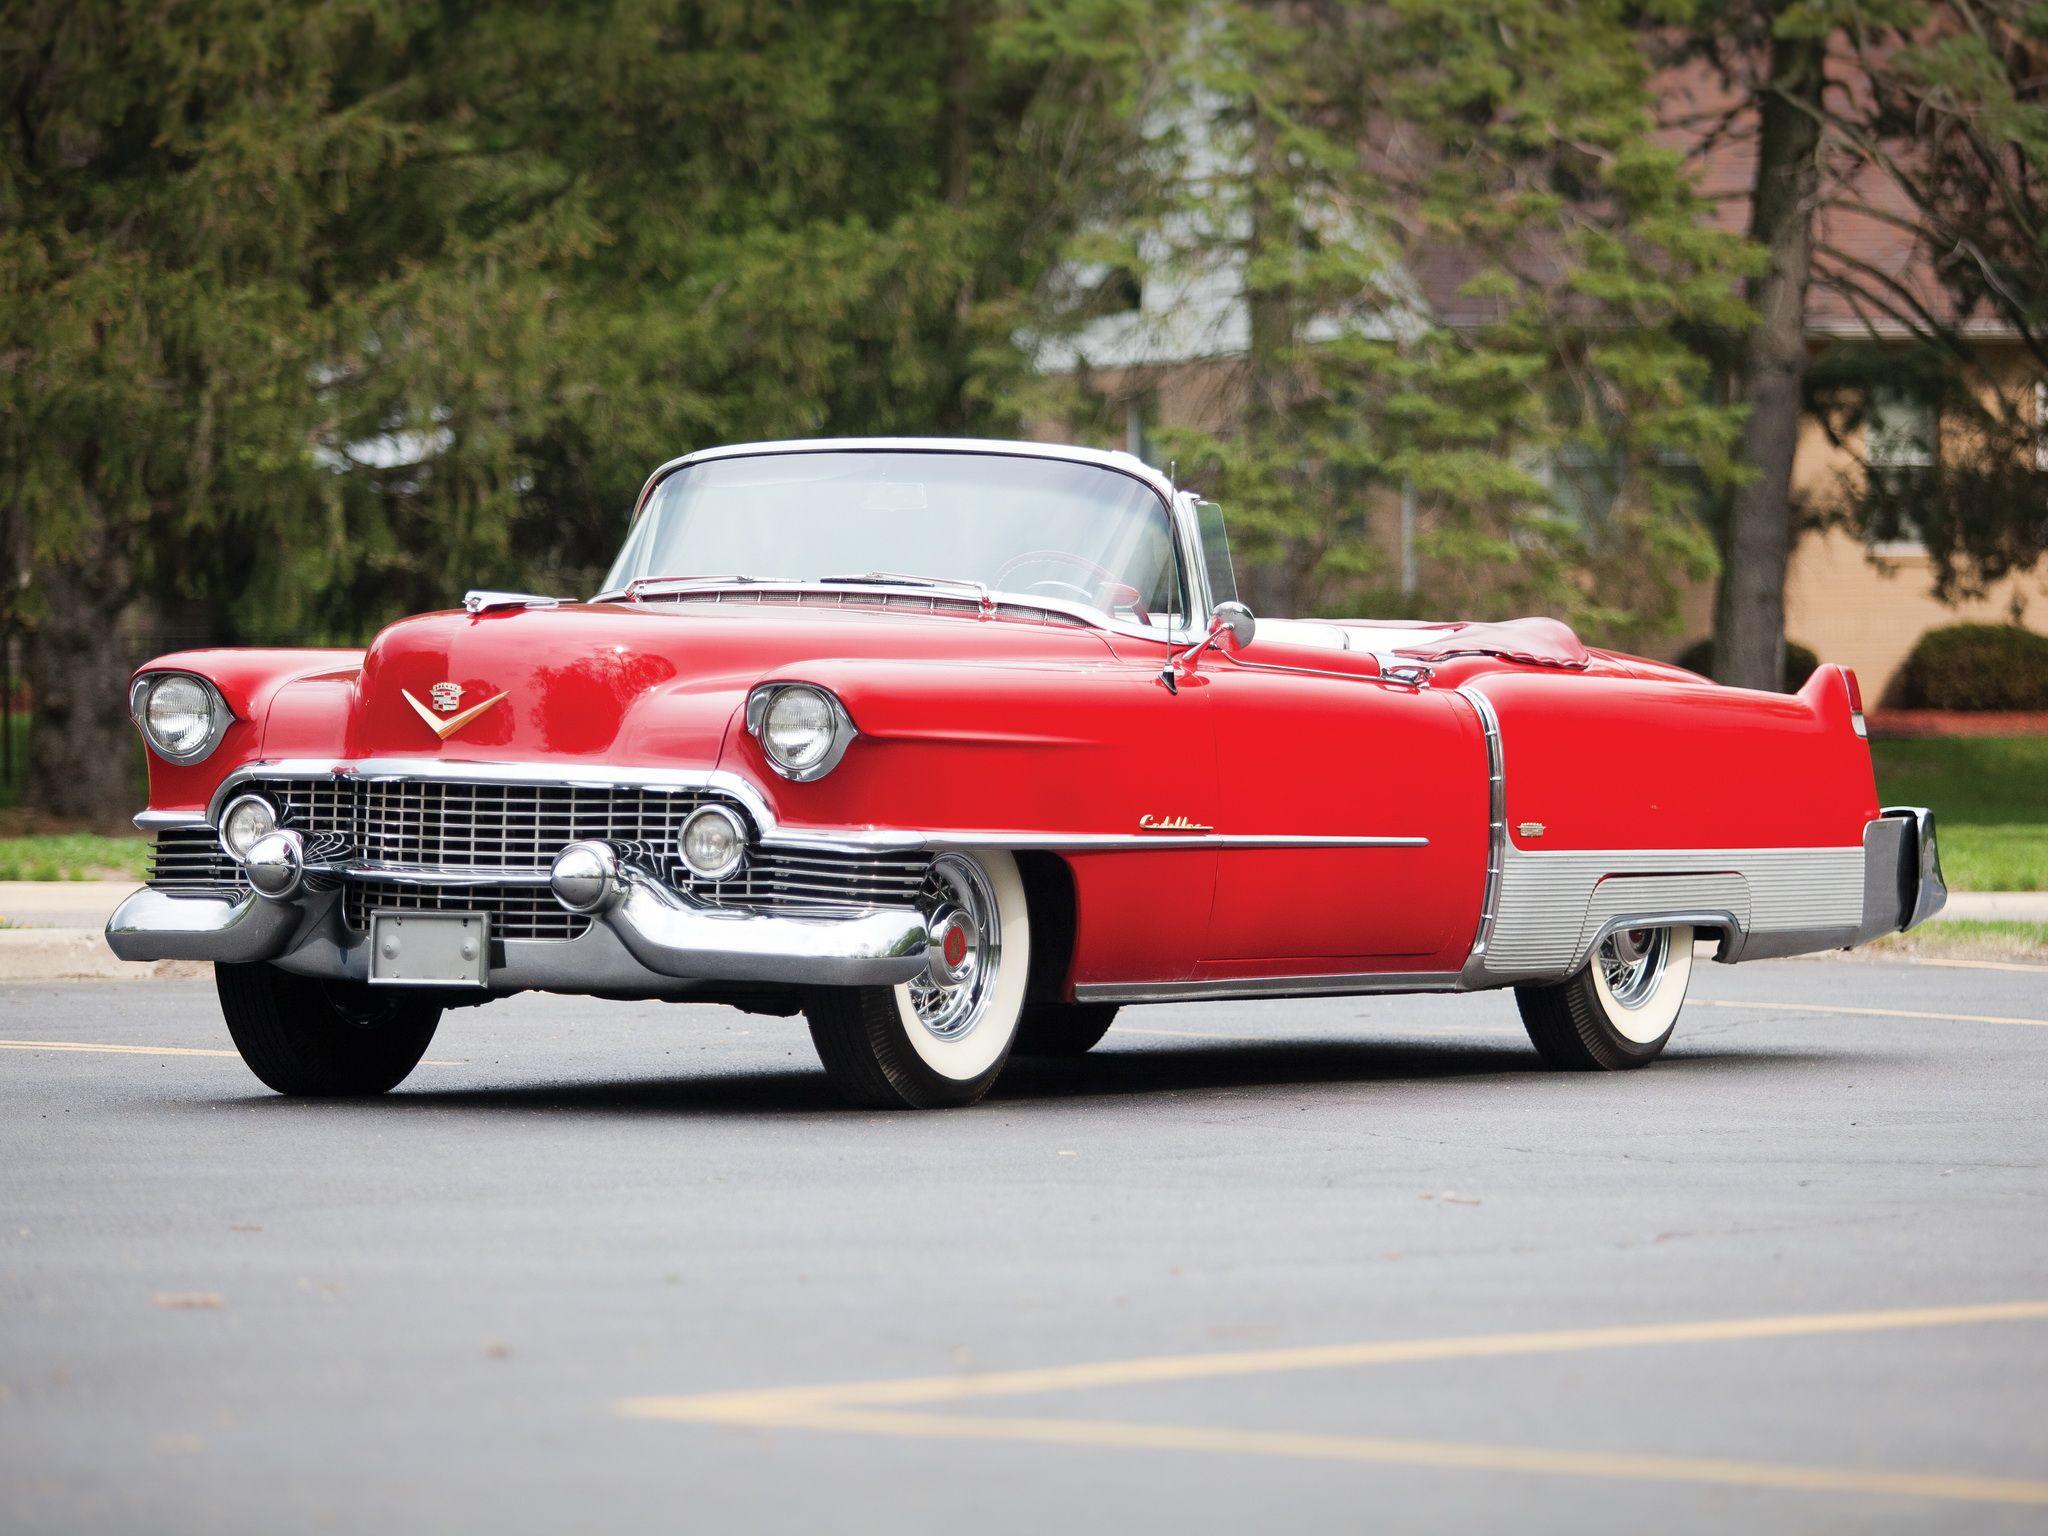 1957 Cadillac Eldorado Seville | 1954 Cadillac Eldorado Convertible ...